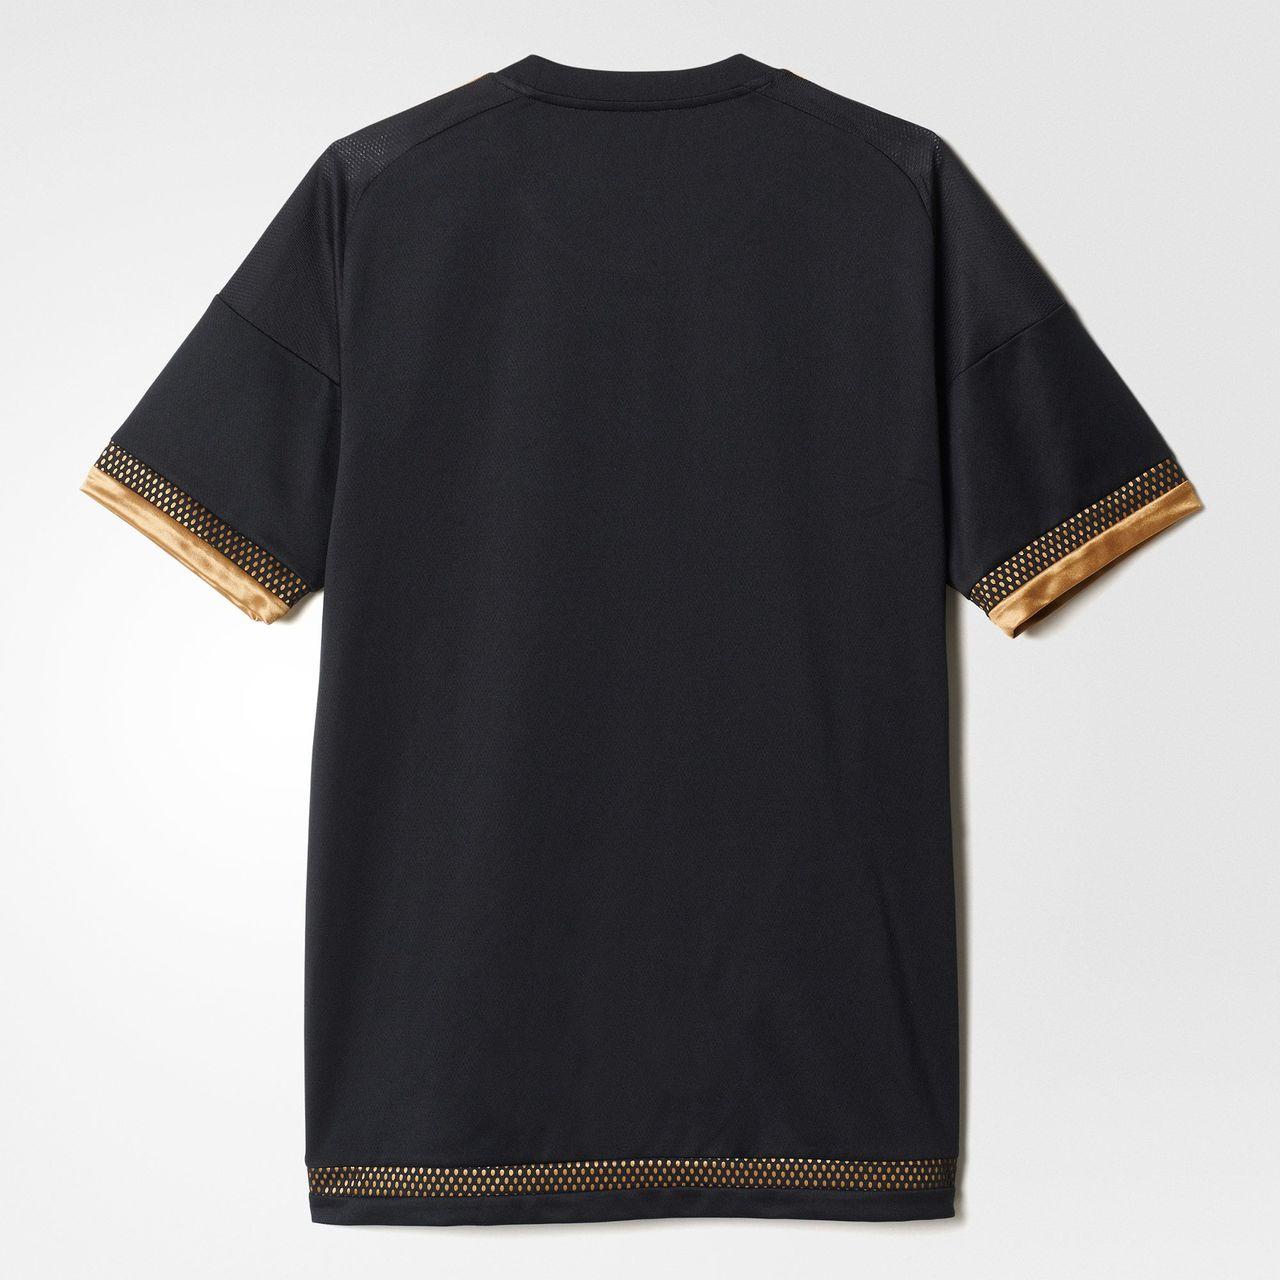 online store b87f6 2e03c Juventus 15/16 Adidas Third Kit | 15/16 Kits | Football ...